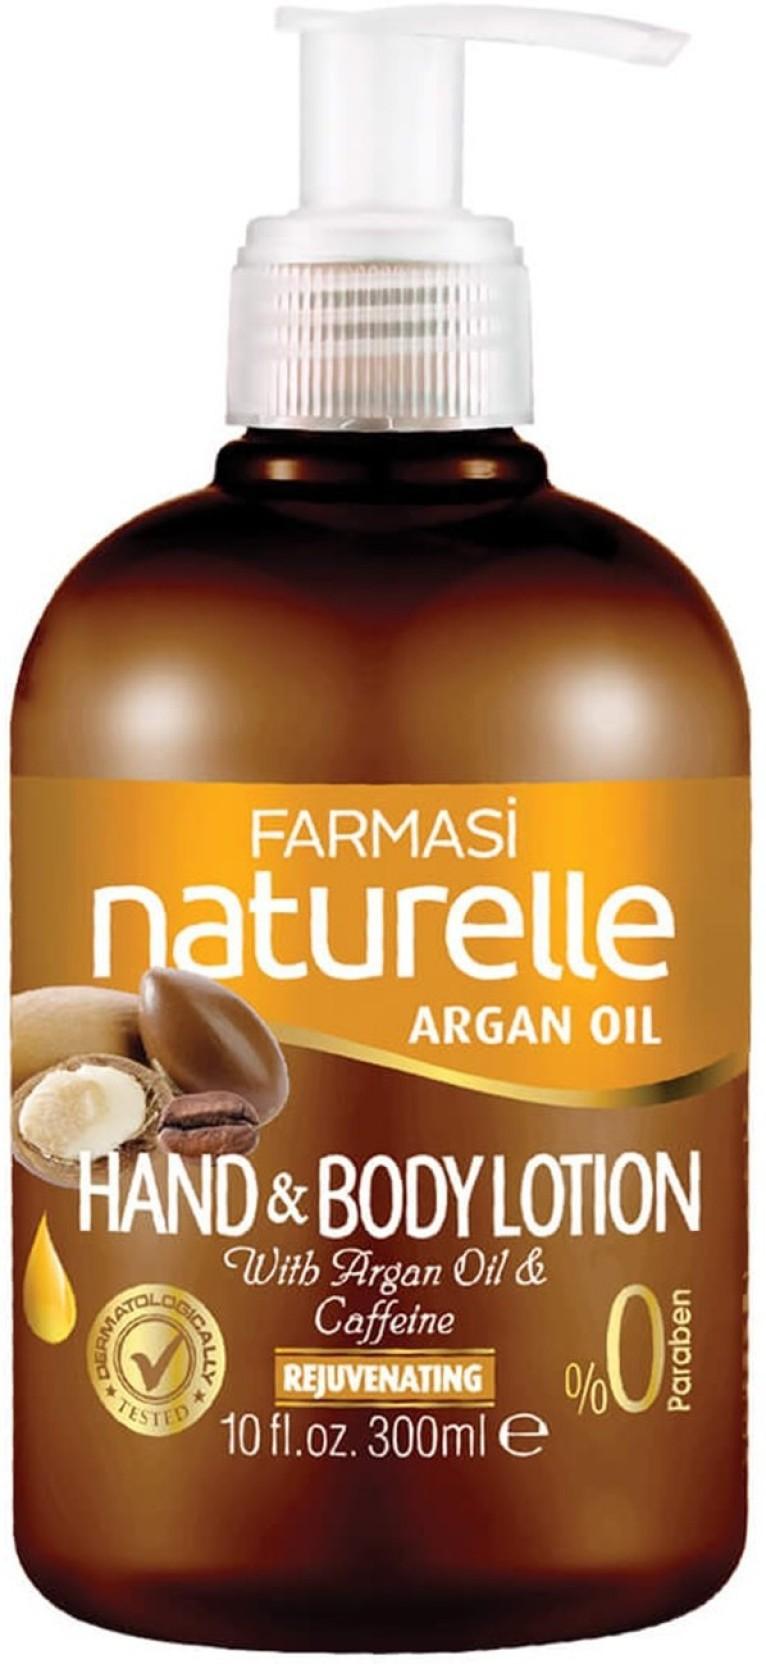 Farmasi Naturelle Rejuvenating Argan Oil Hand Body Lotion 300ml Buy 1 Get Natur E Daily Nourishing 100 Ml I Handbody Add To Cart Now